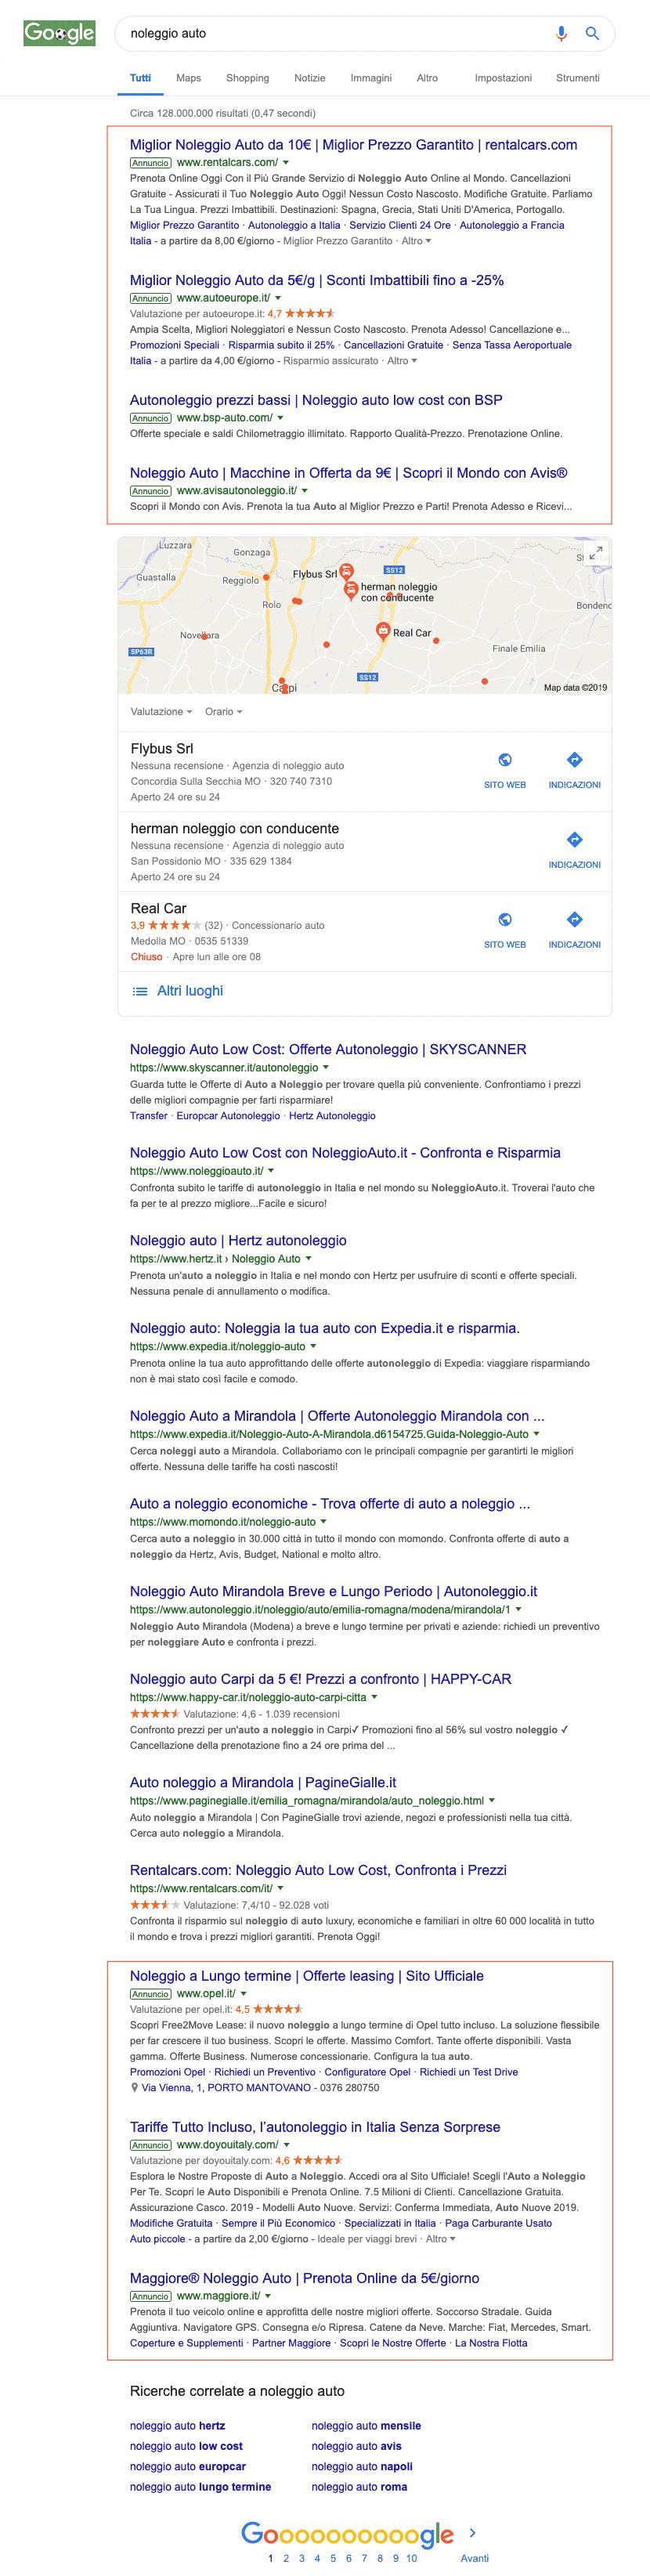 SERP con Google Ads